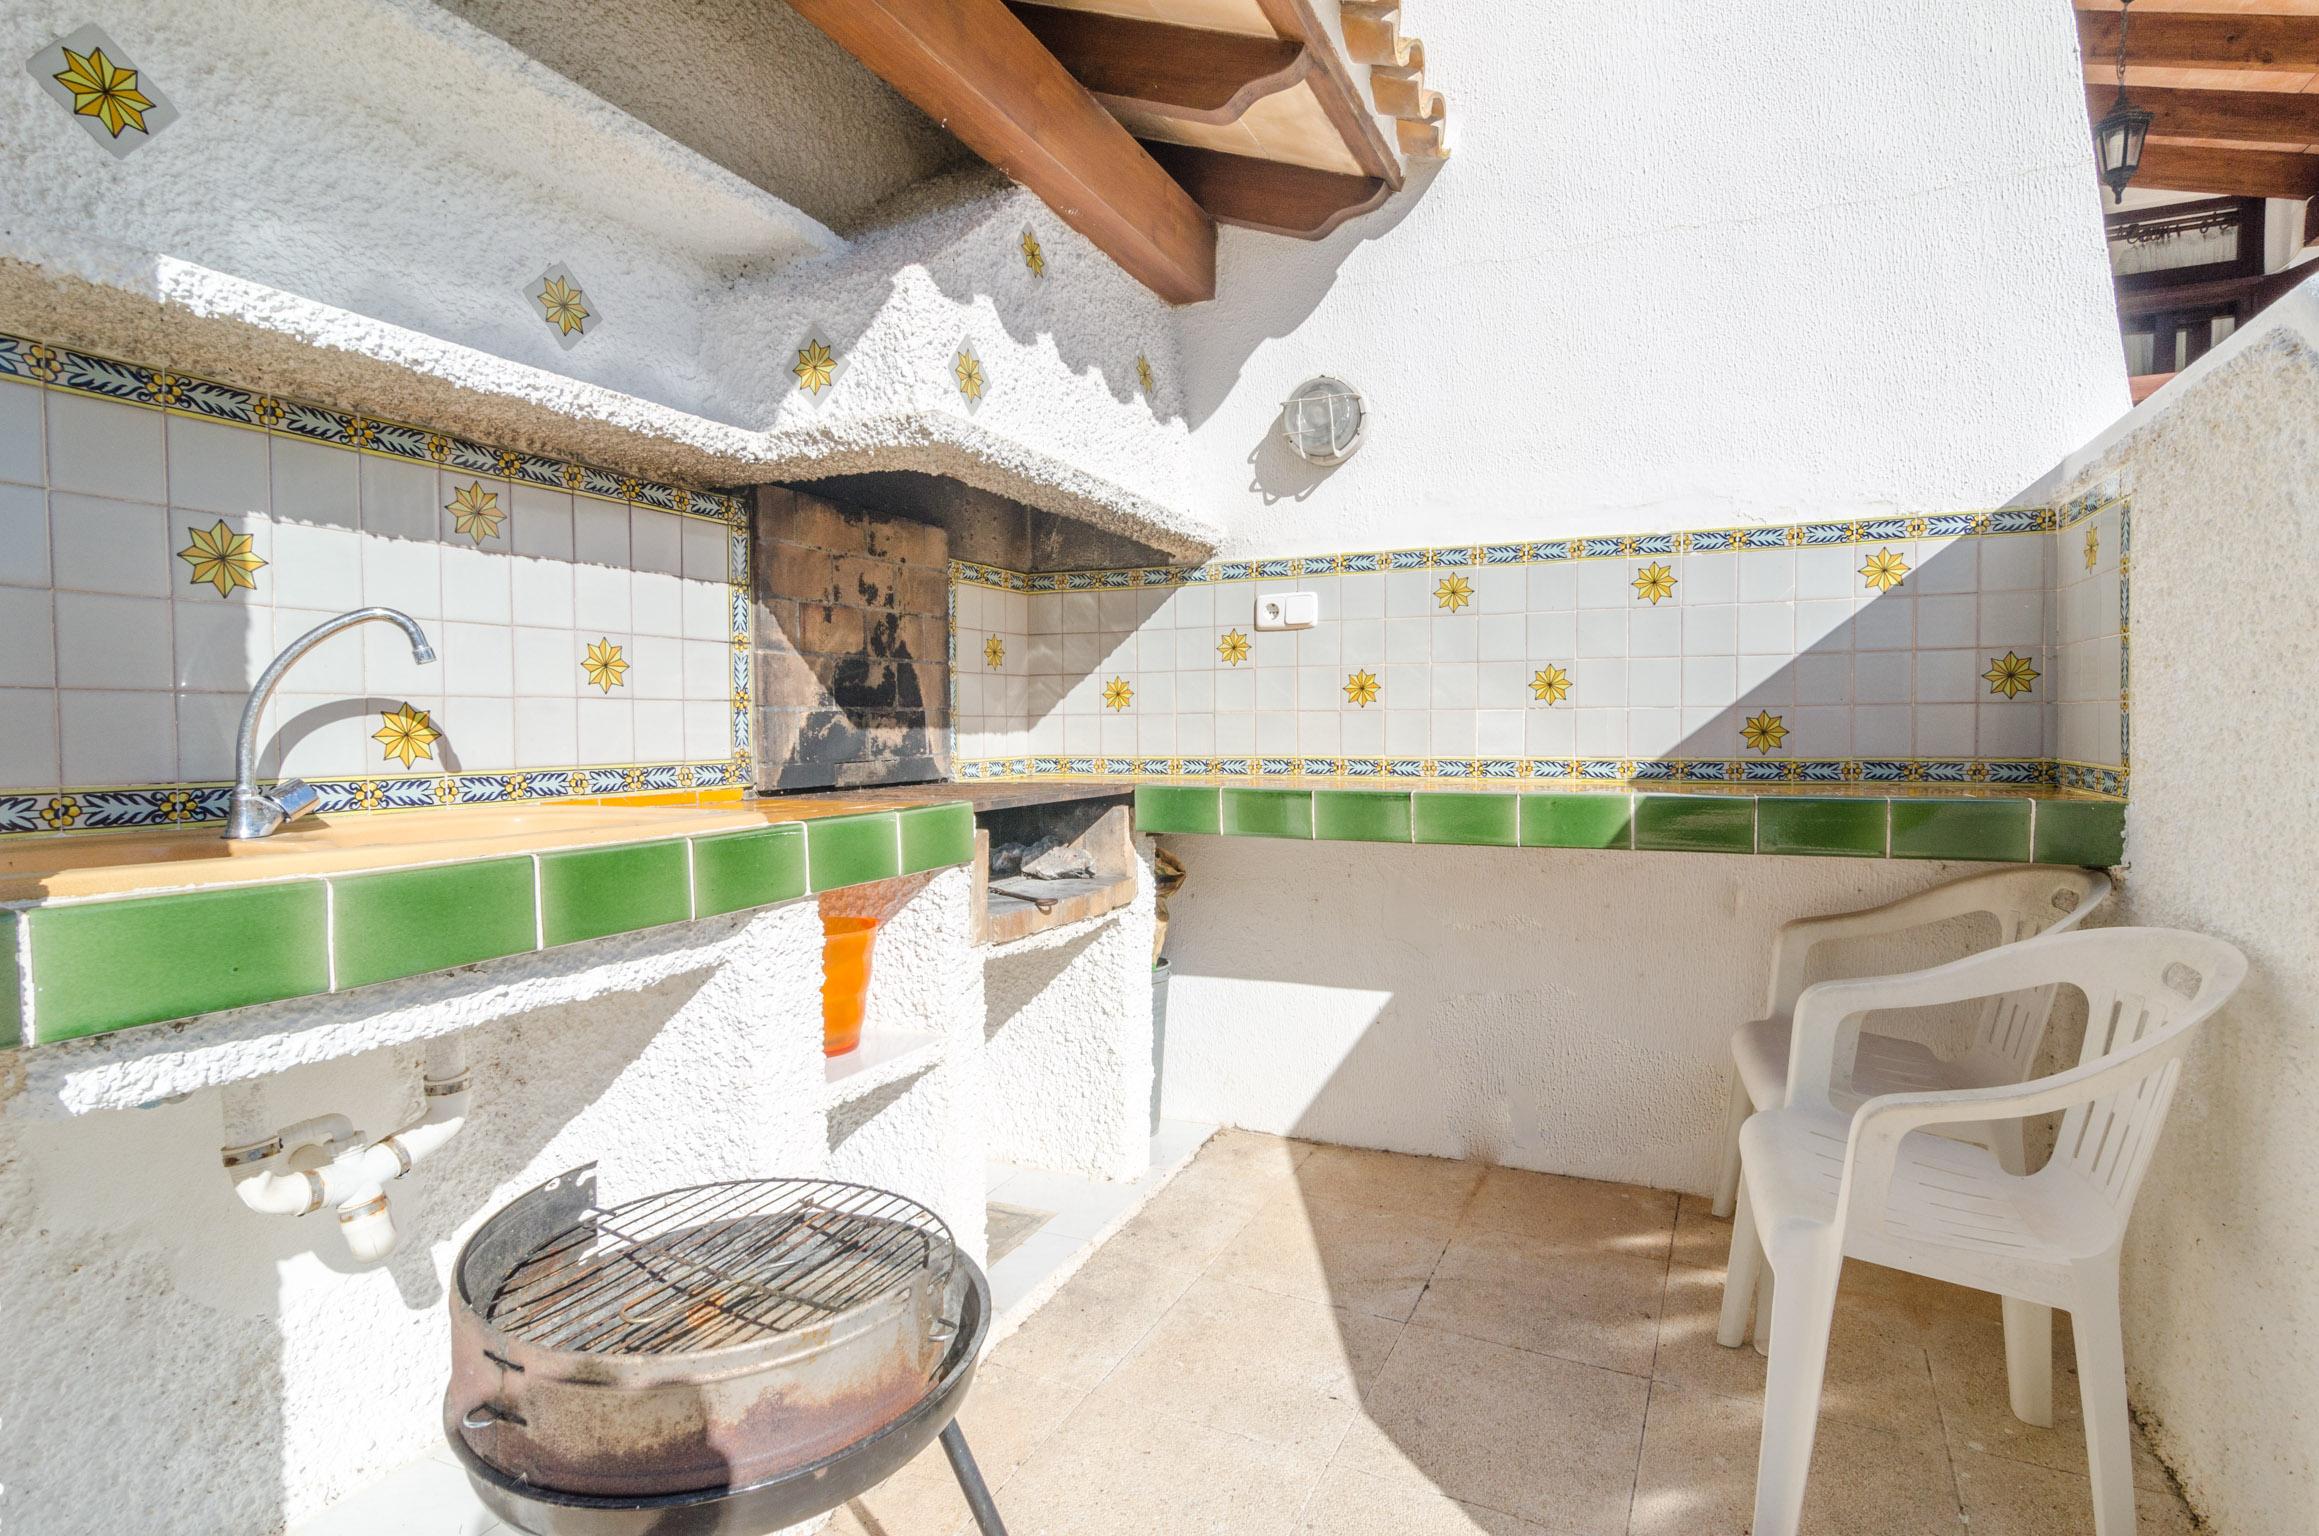 Ferienhaus CAN CALSINA (1871676), Cala Mandia, Mallorca, Balearische Inseln, Spanien, Bild 23